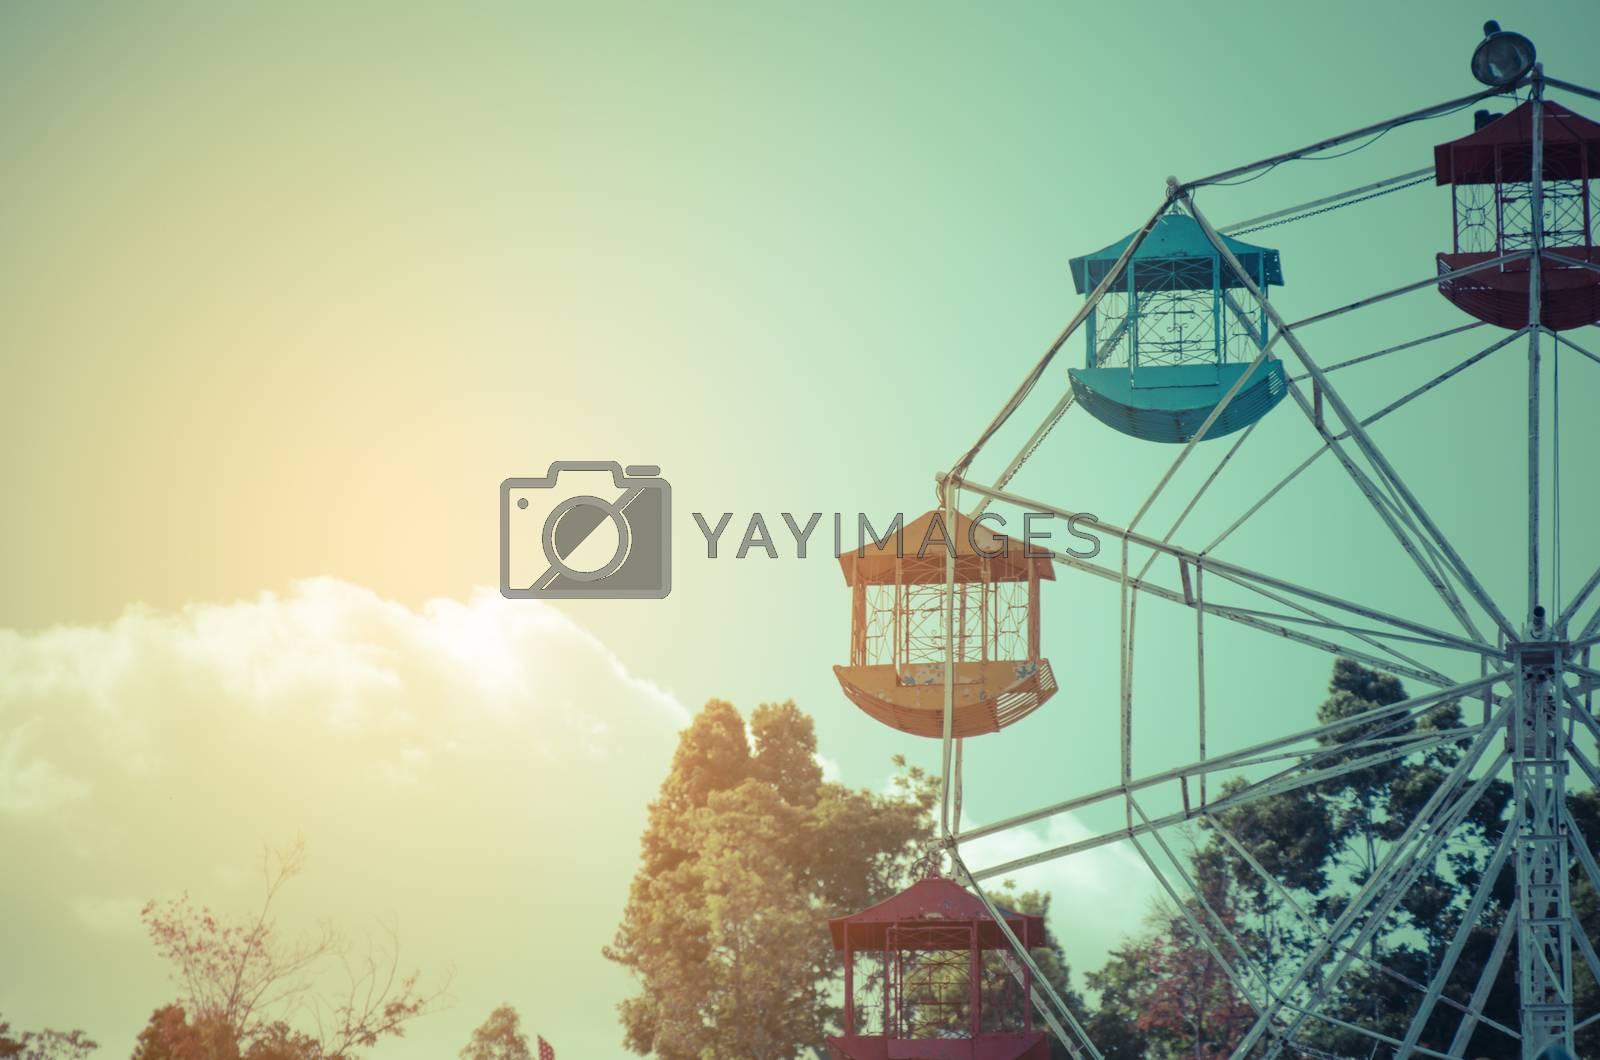 Ferris Wheel - vintage filter effect